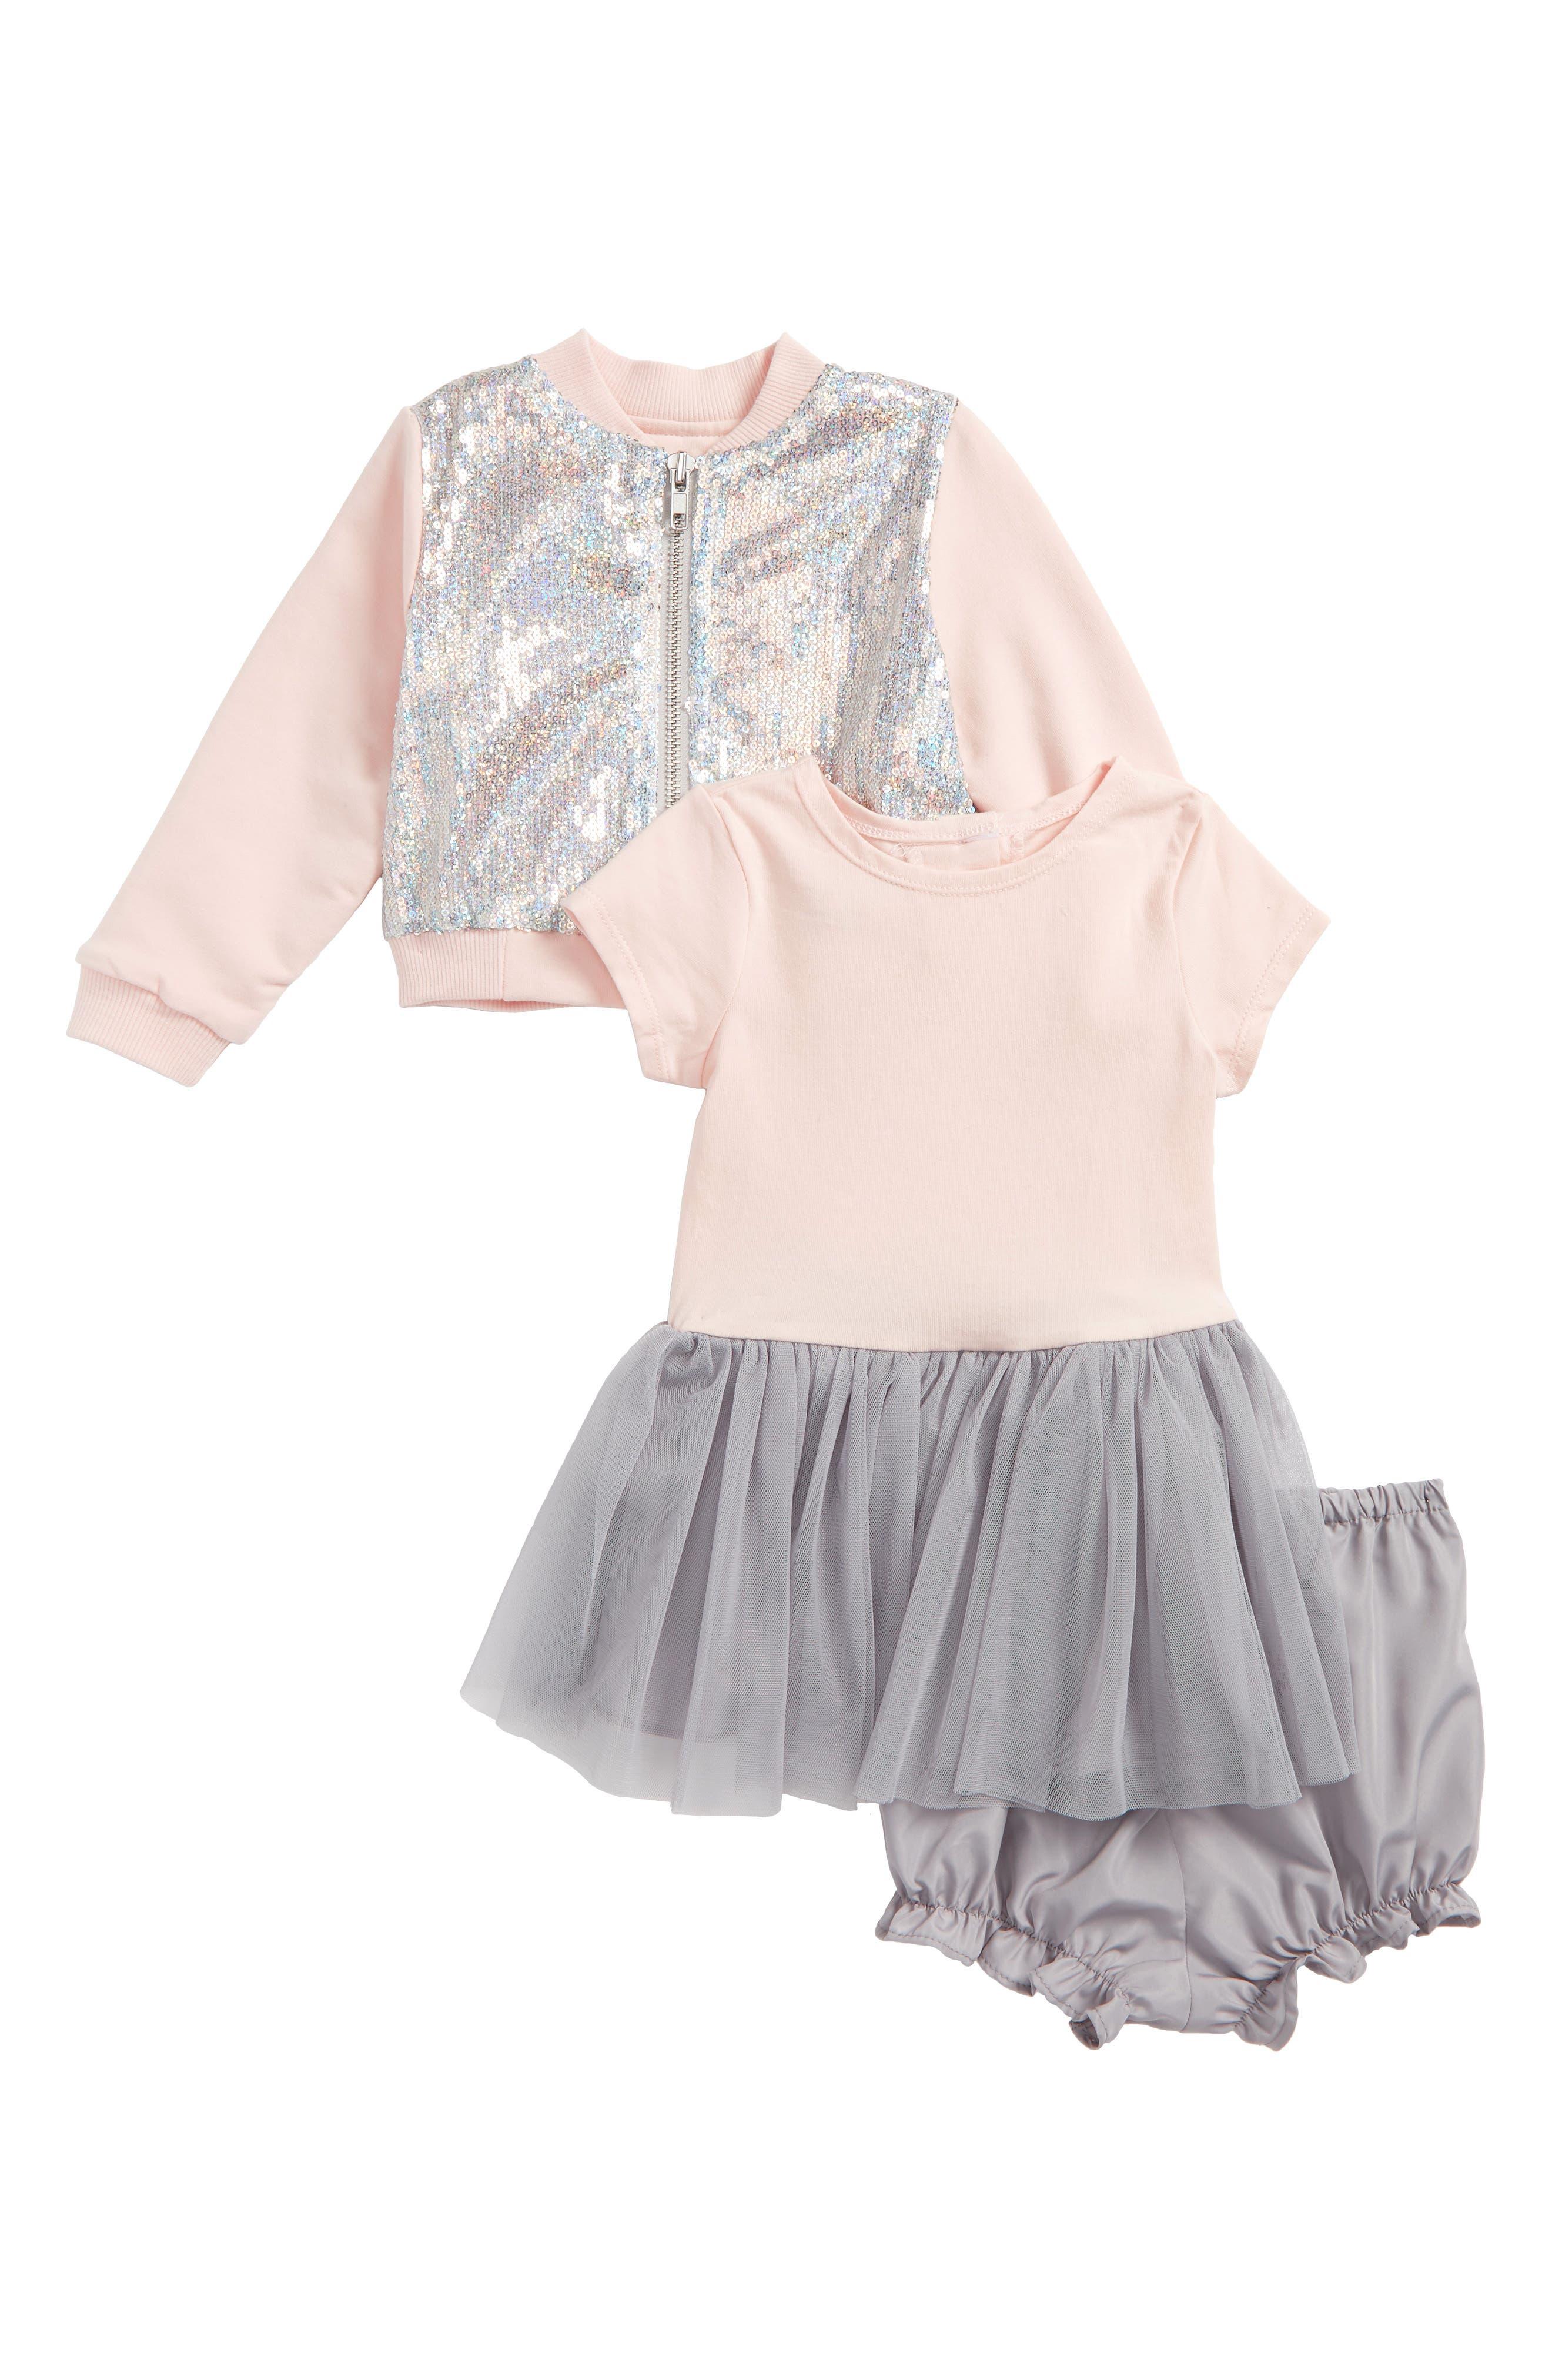 Main Image - Pippa & Julie Sequin Bomber Jacket & Tulle Dress Set (Baby Girls)